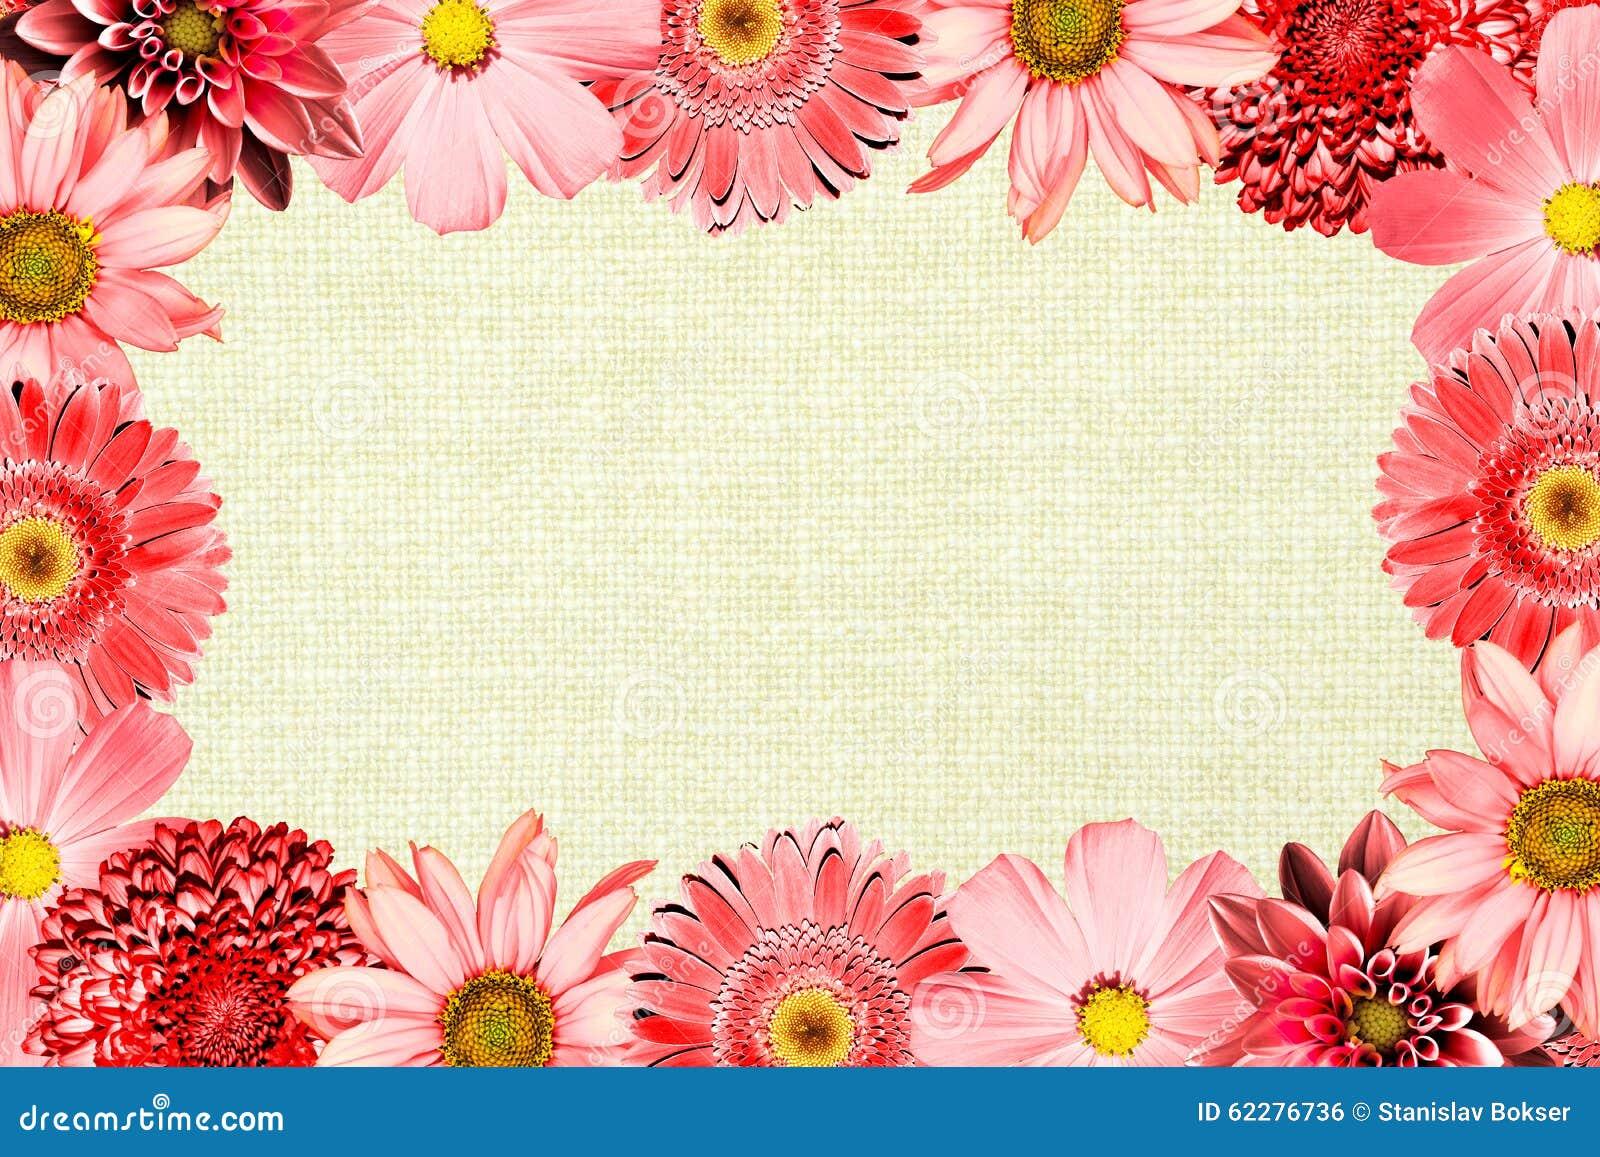 Vintage Frame With Red Flowers Collage Mix Gerbera, Chrysanthemum ...